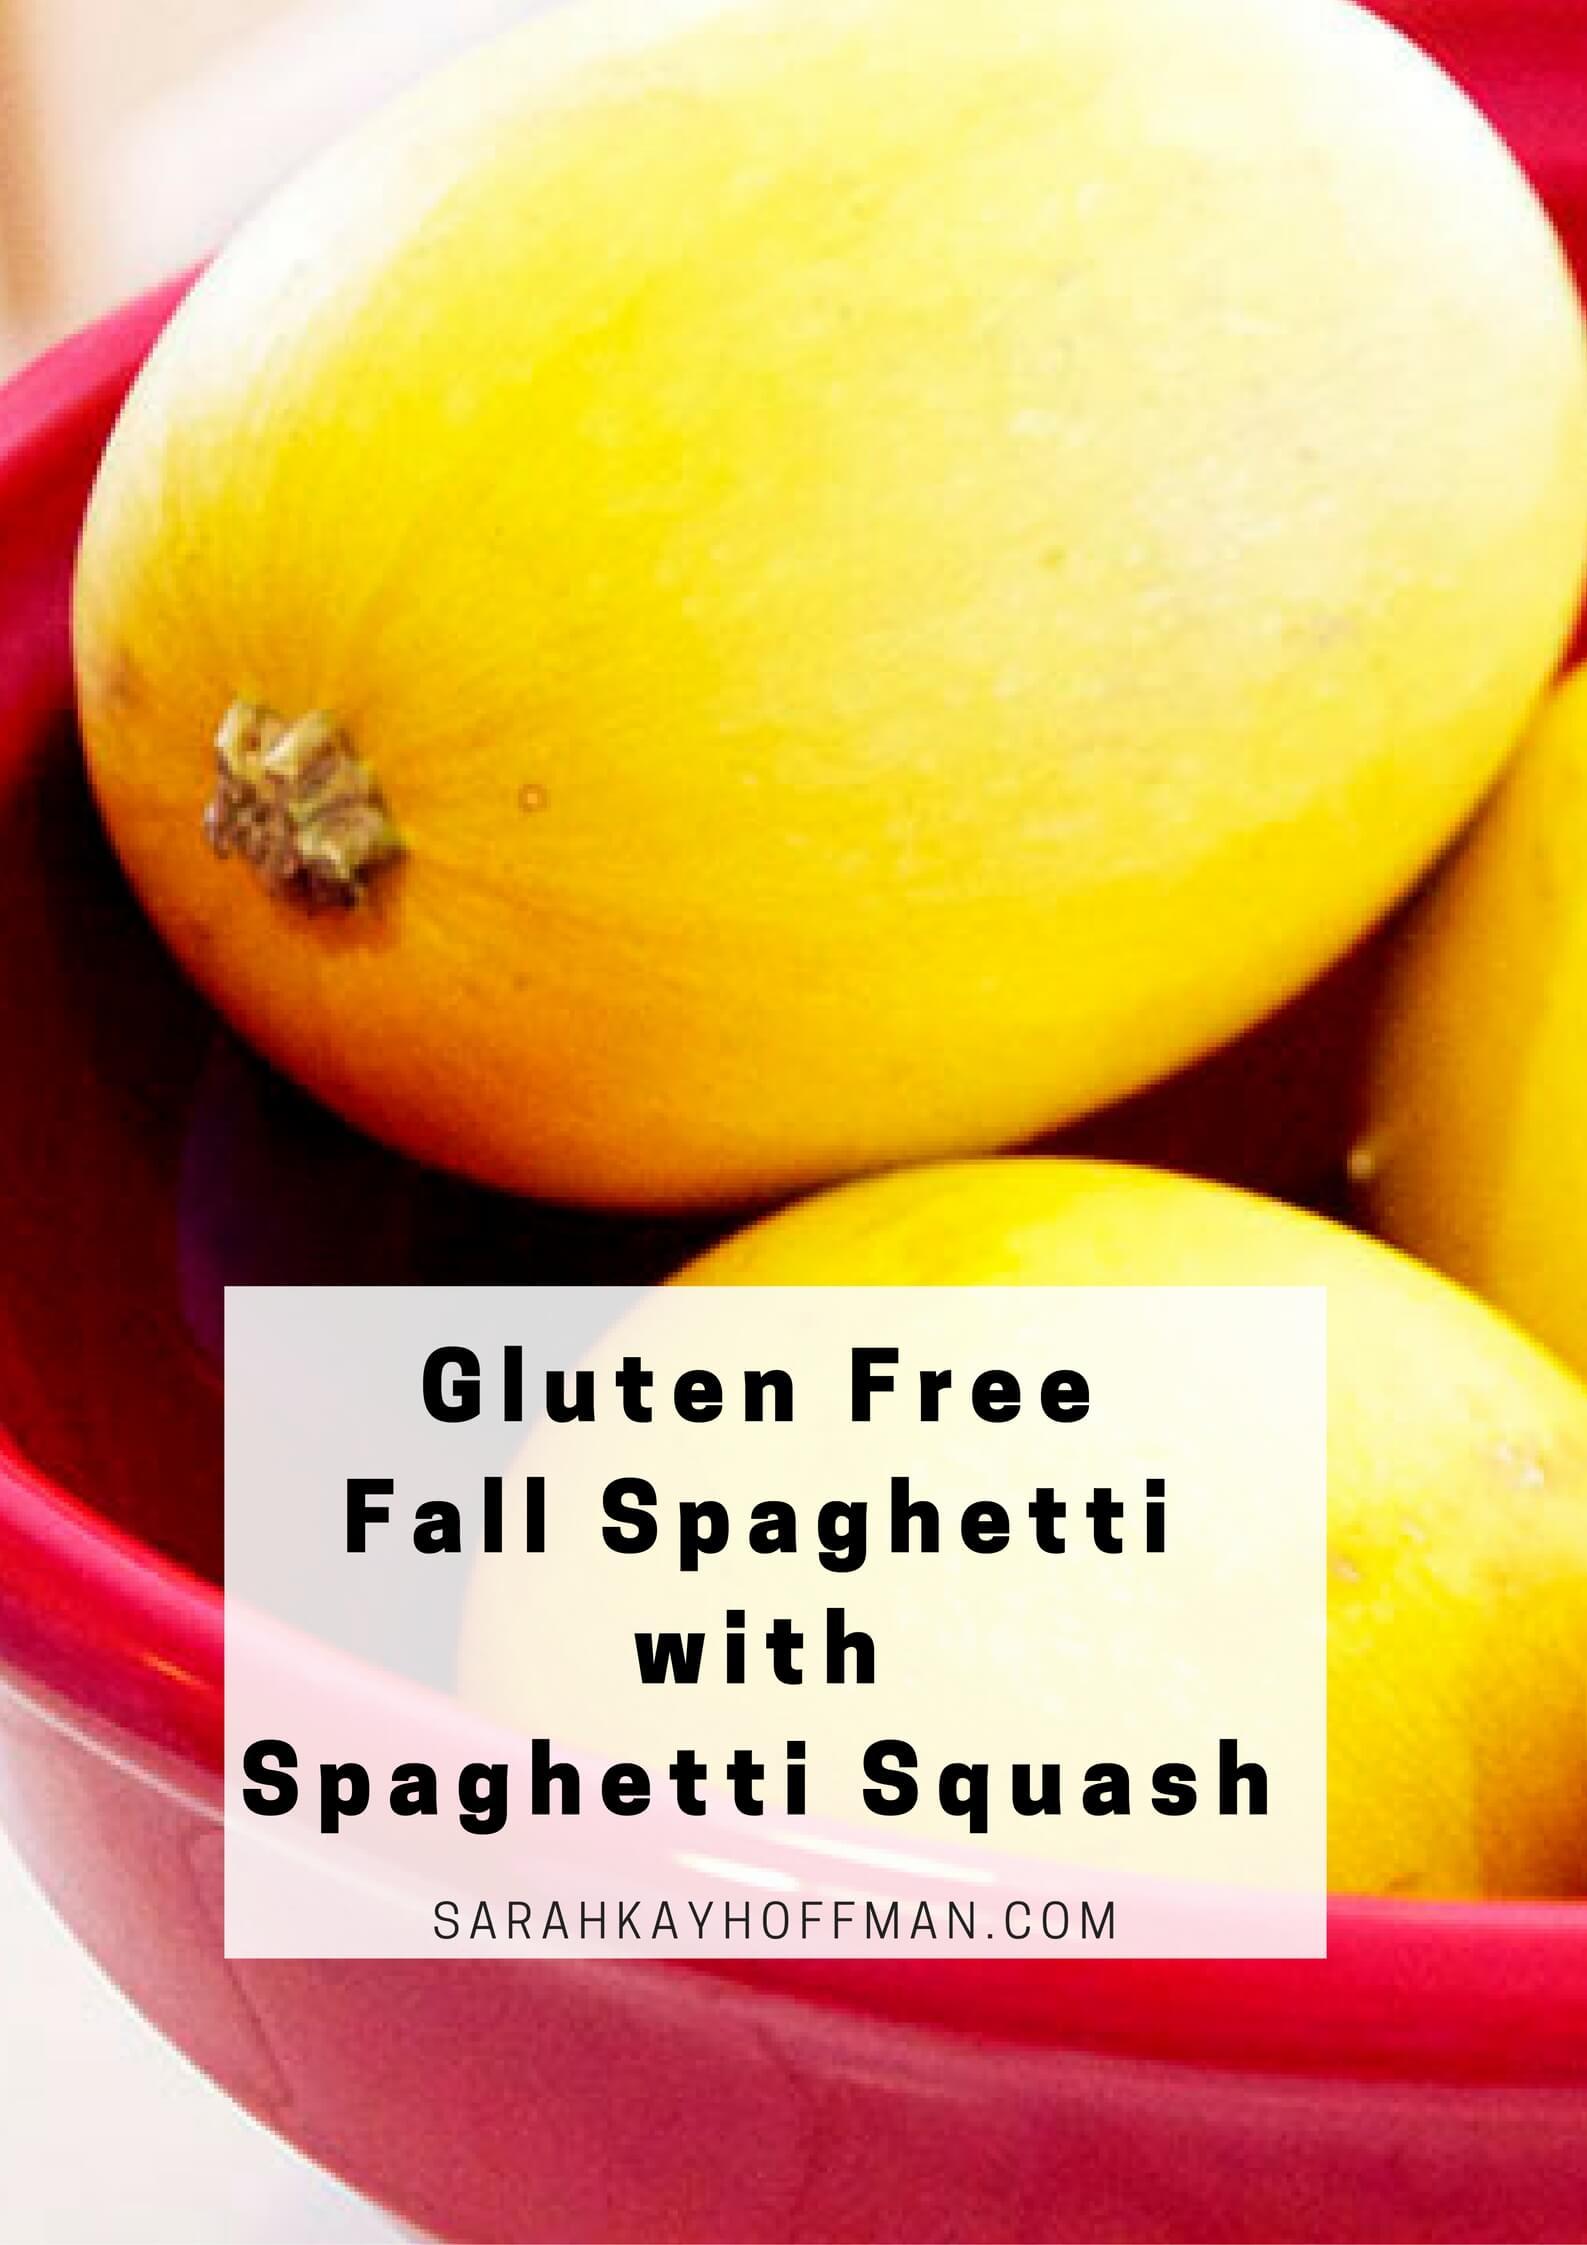 Gluten Free Fall Spaghetti with Spaghetti Squash sarahkayhoffman.com